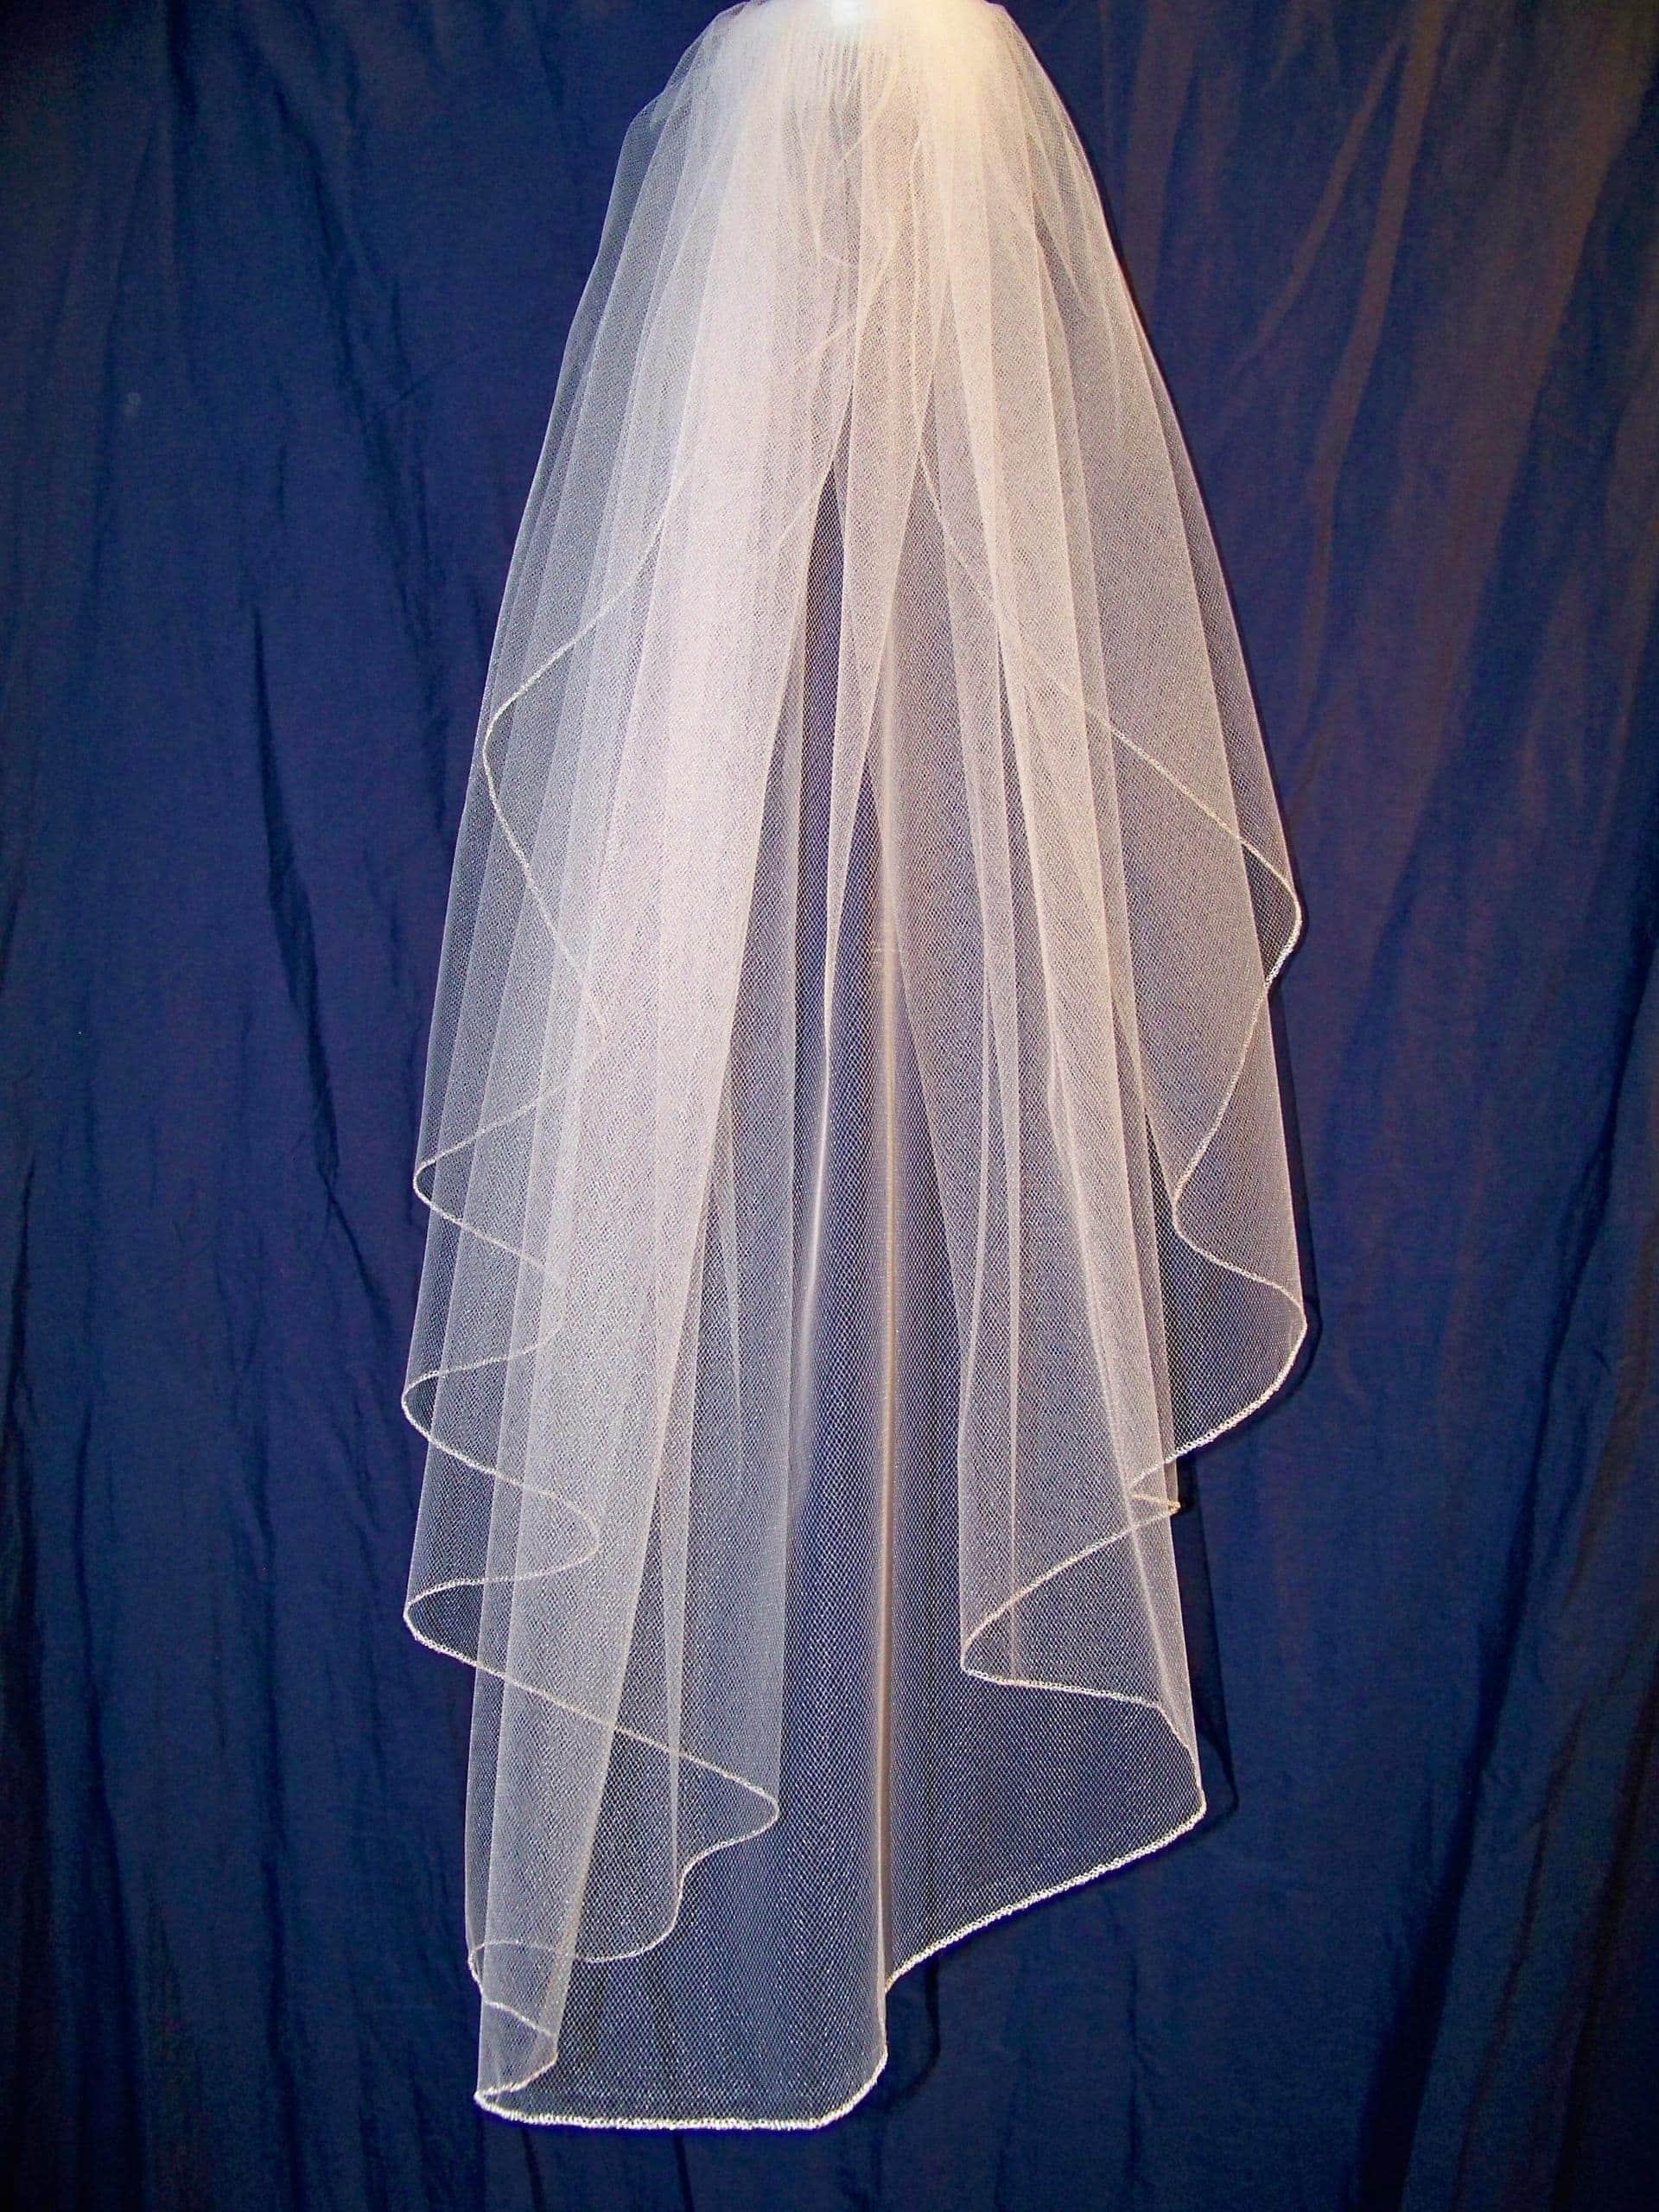 veil dream meaning, dream about veil, veil dream interpretation, seeing in a dream veil